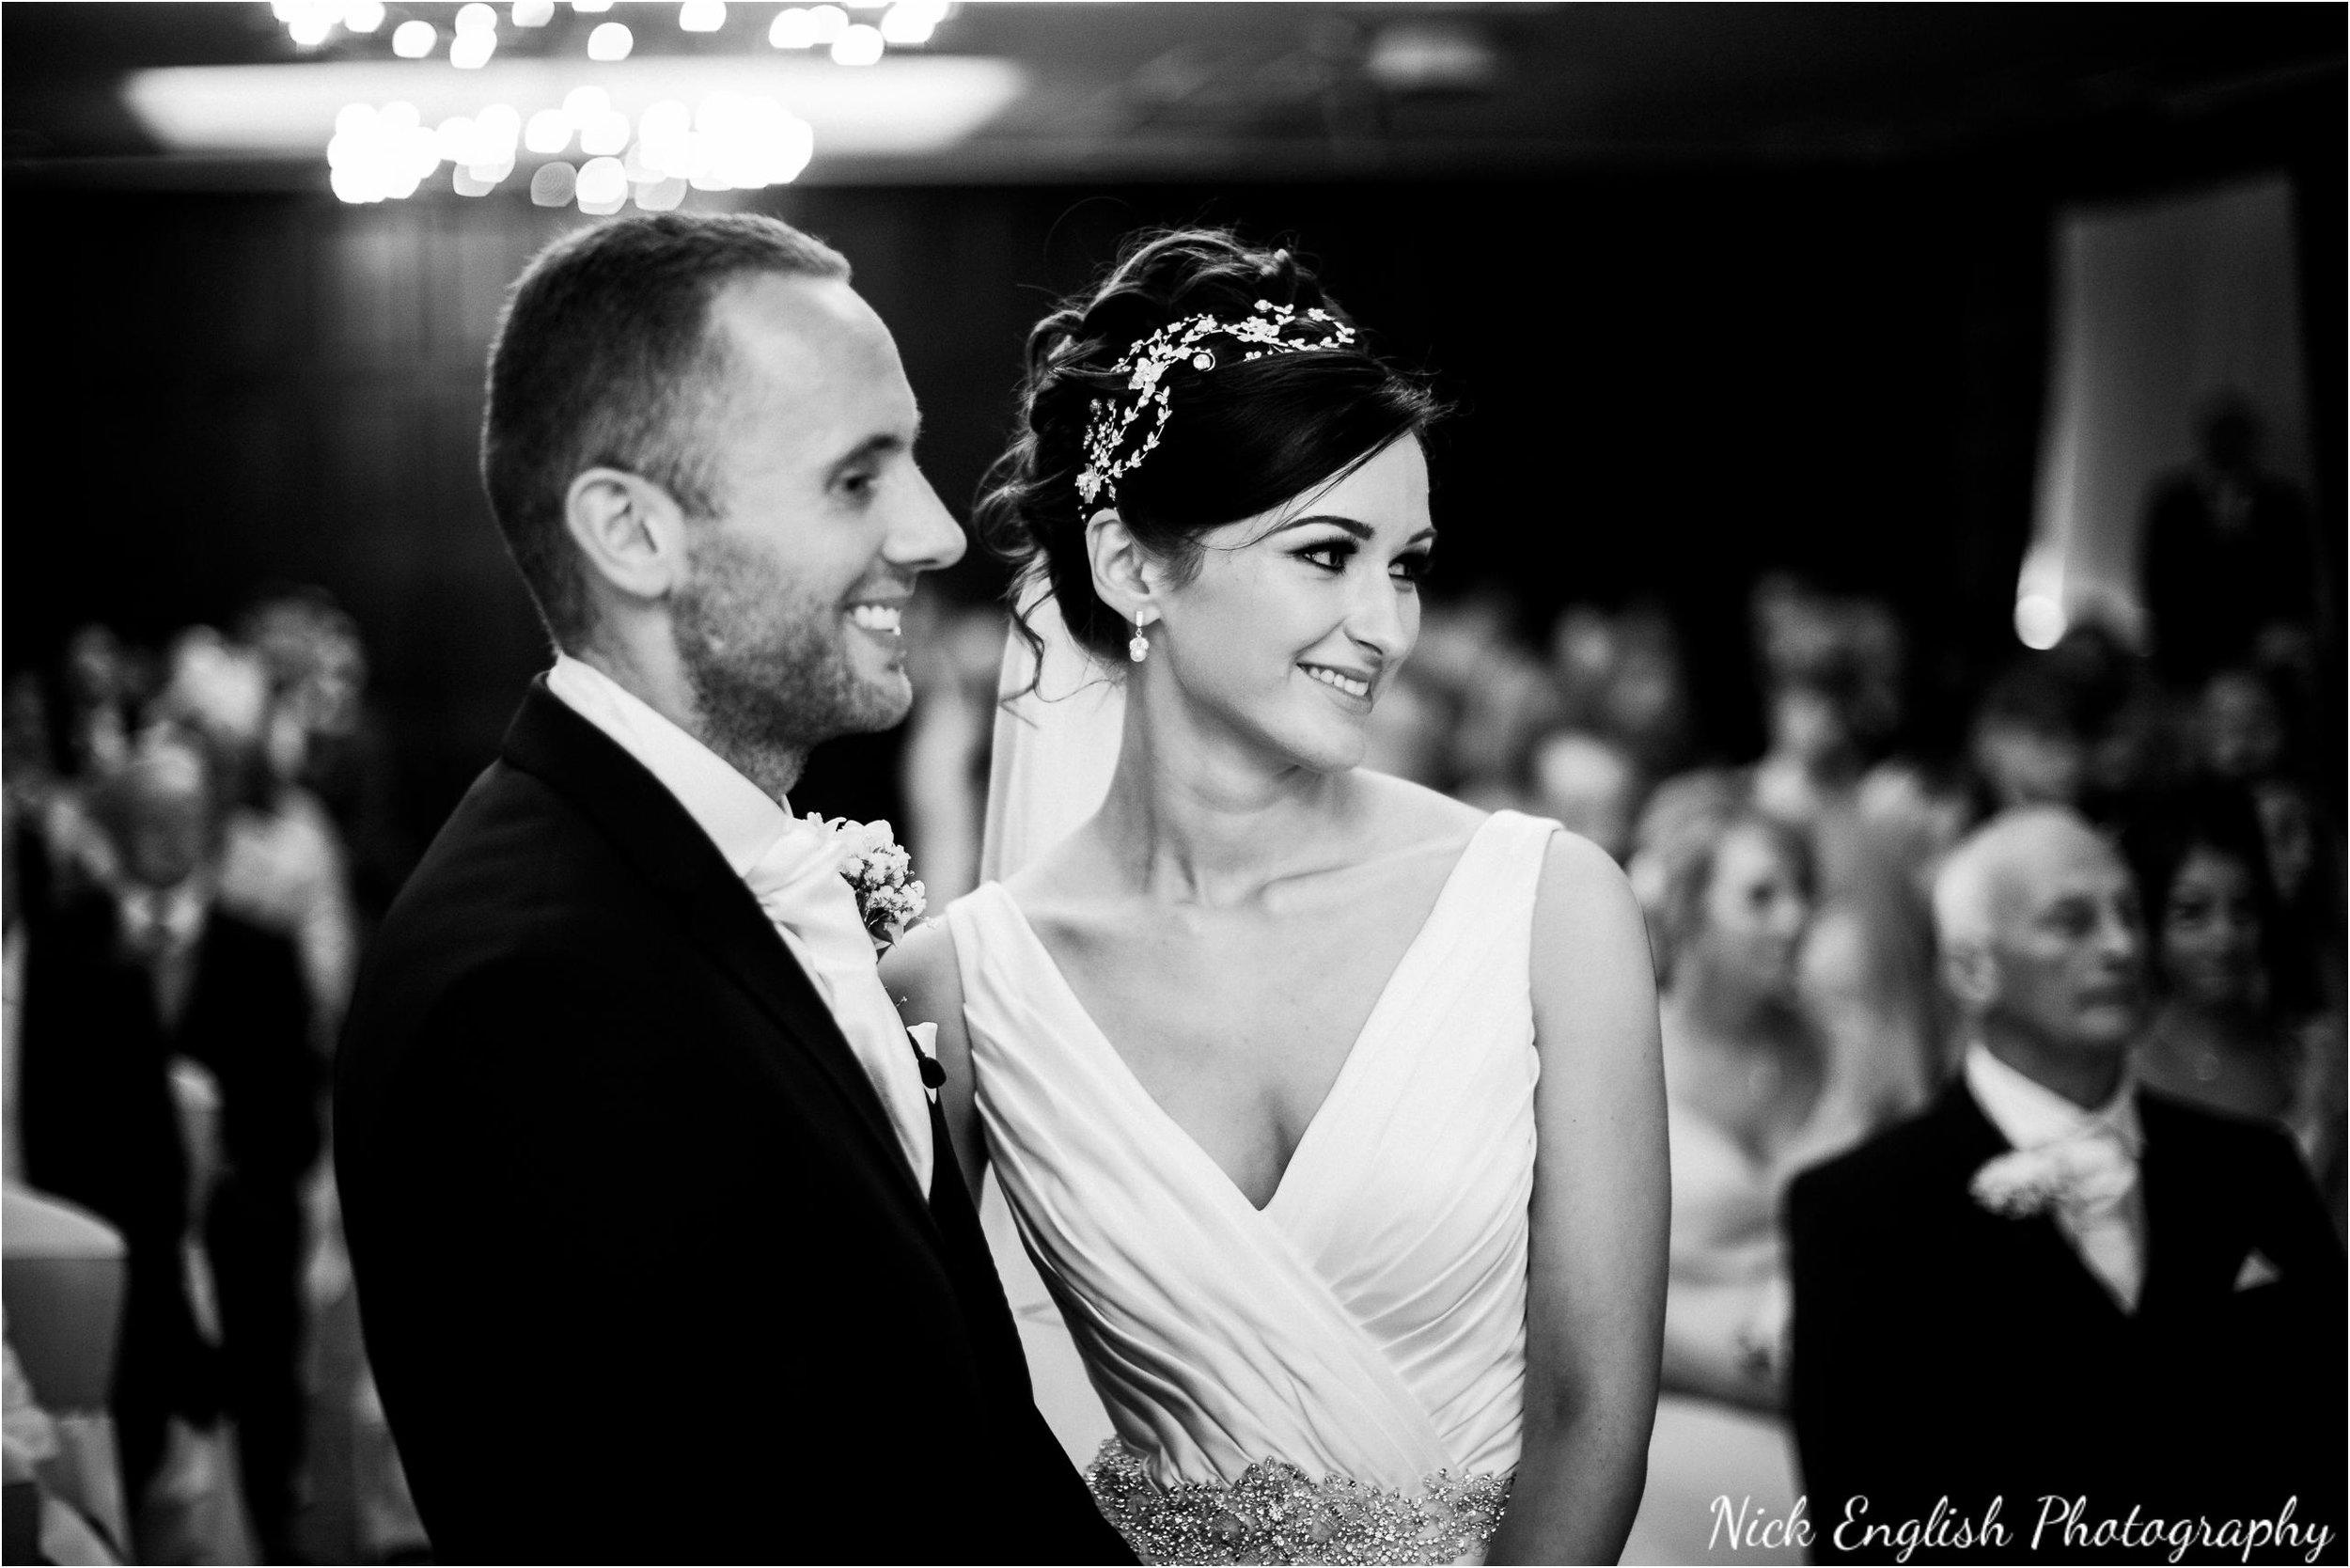 Emily David Wedding Photographs at Barton Grange Preston by Nick English Photography 71jpg.jpeg